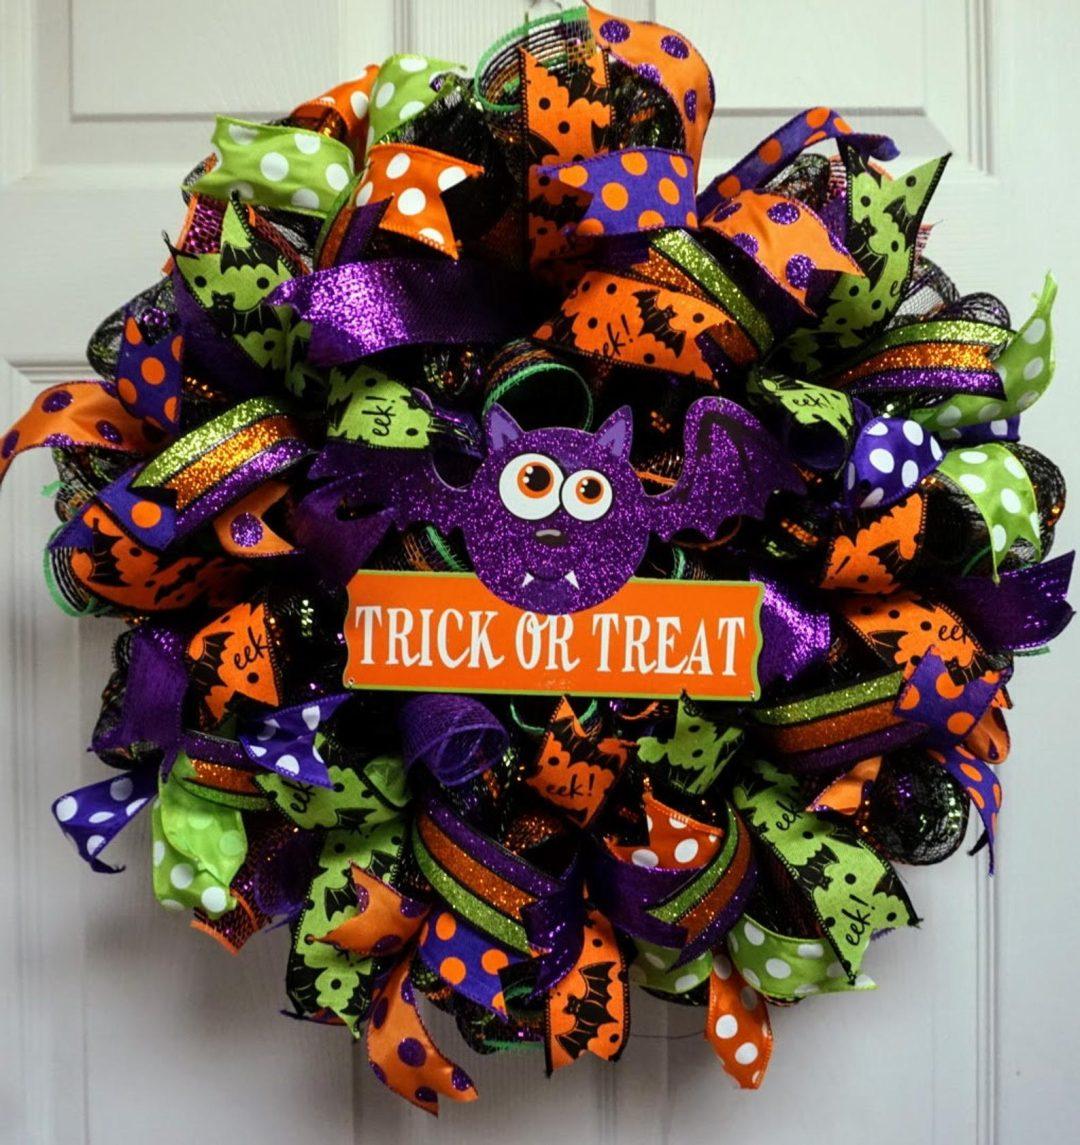 Orange, green and purple Halloween wreaths with bat